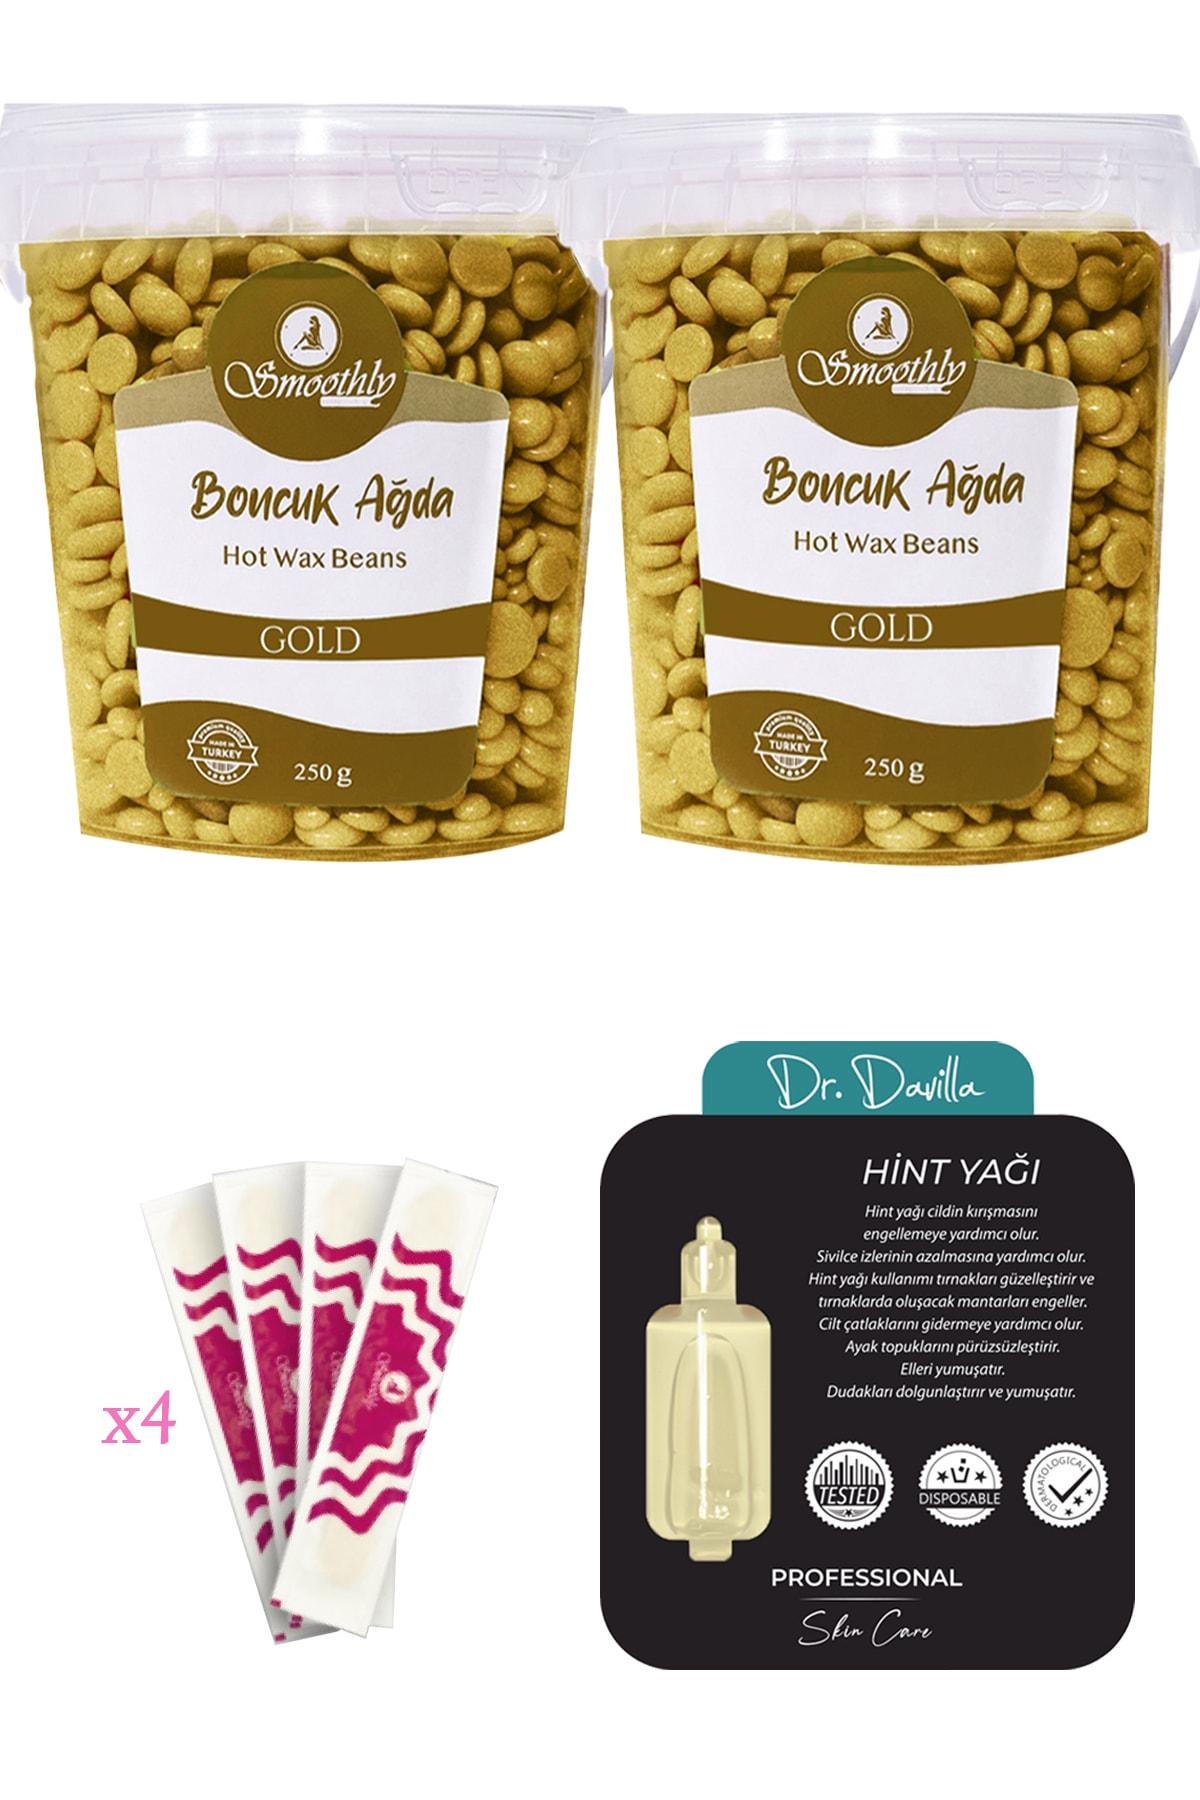 Gold Yüz Bikini Bölgesi Soyulabilir Granül Boncuk Ağda 2 X250 G.+tekli Hint Yağı +4 Spatula